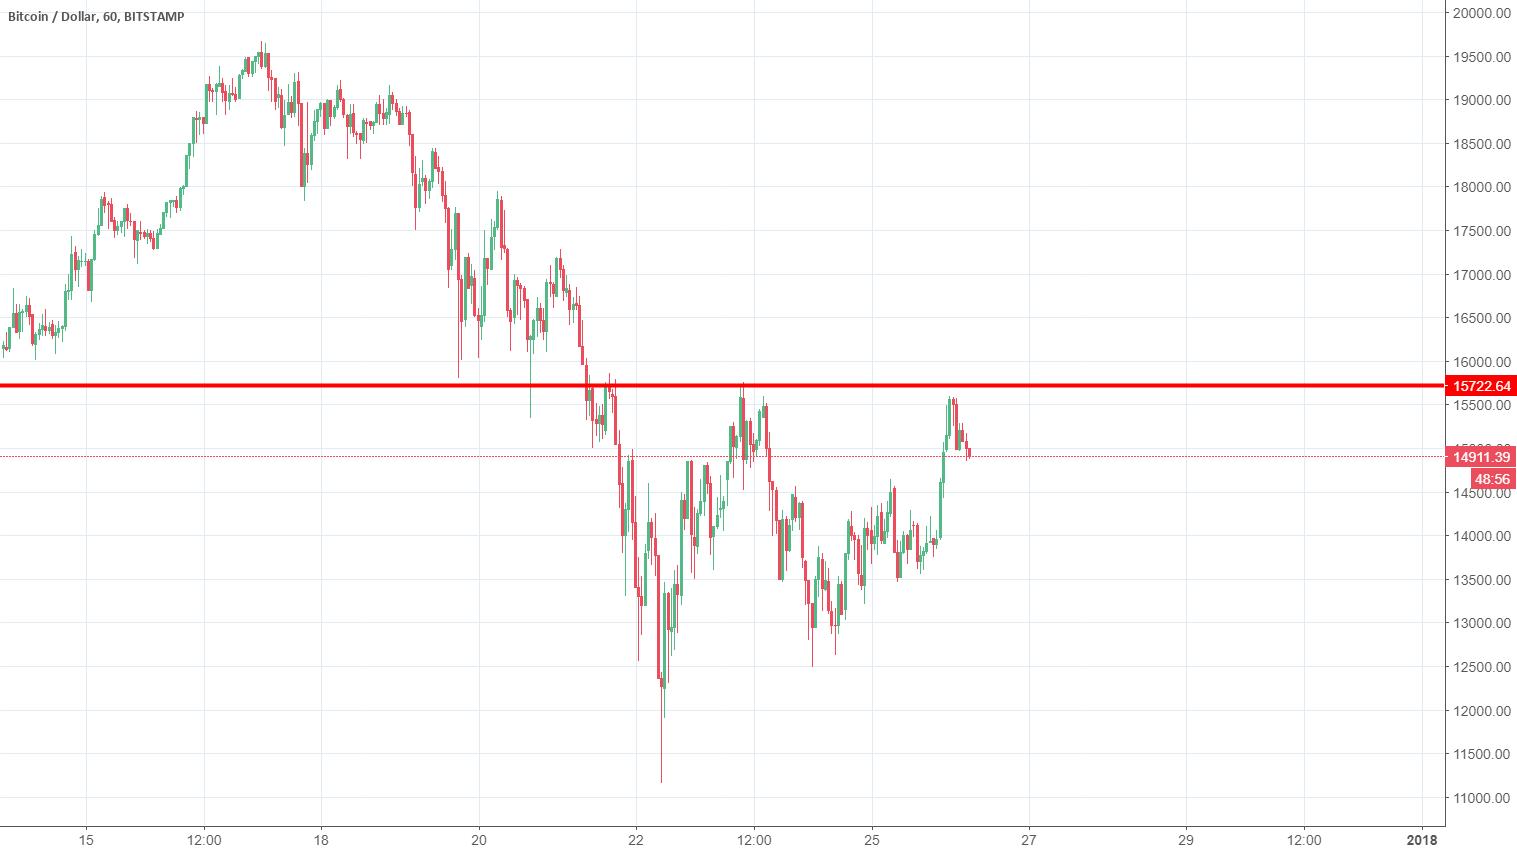 Bitcoin Back at Resistance $16k